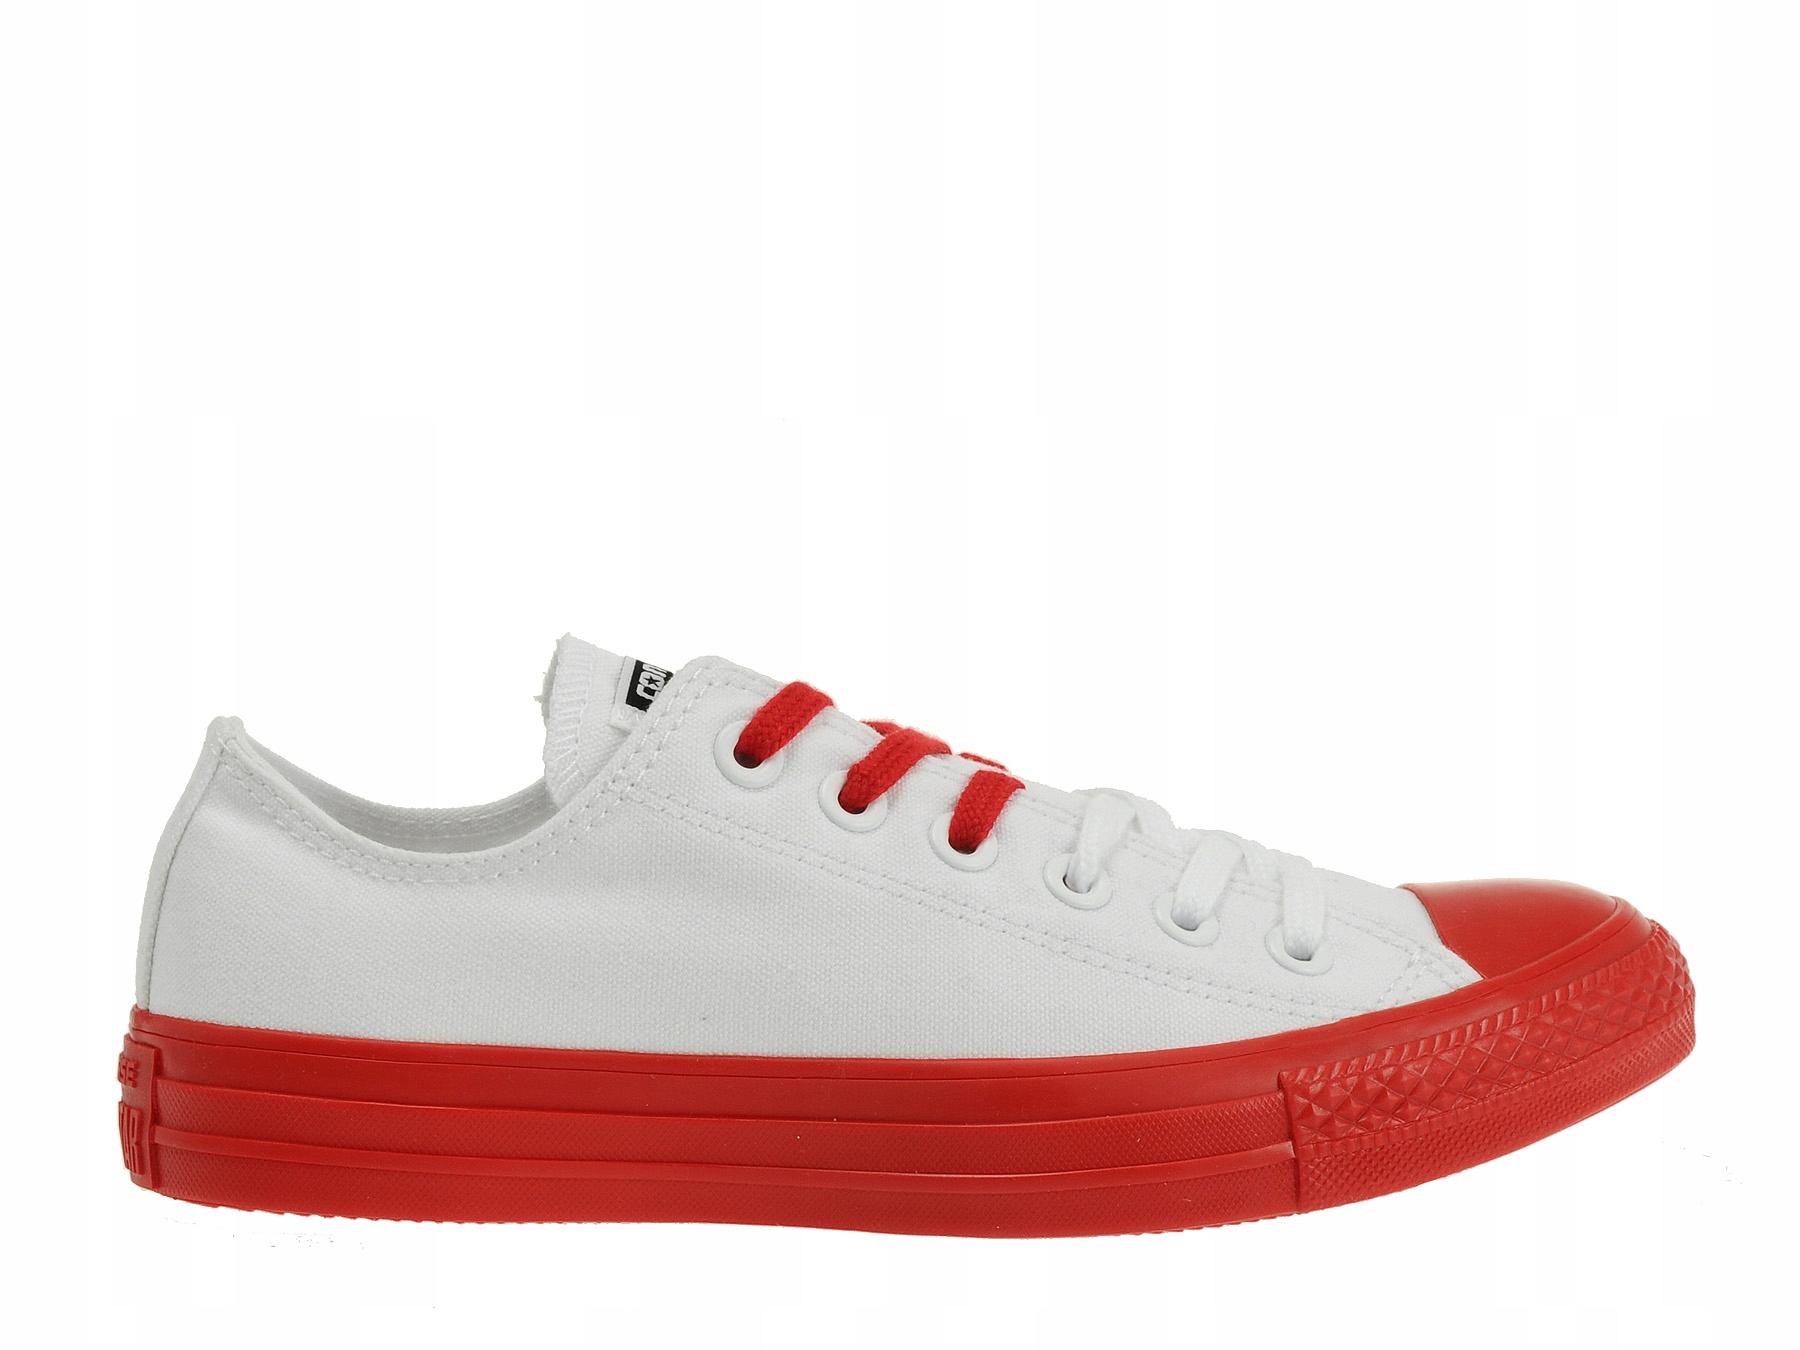 cb8aa4622347b Converse buty trampki All Star białe M7652 38. Buty Converse 156776 Białe  Czerwone Niskie (37)